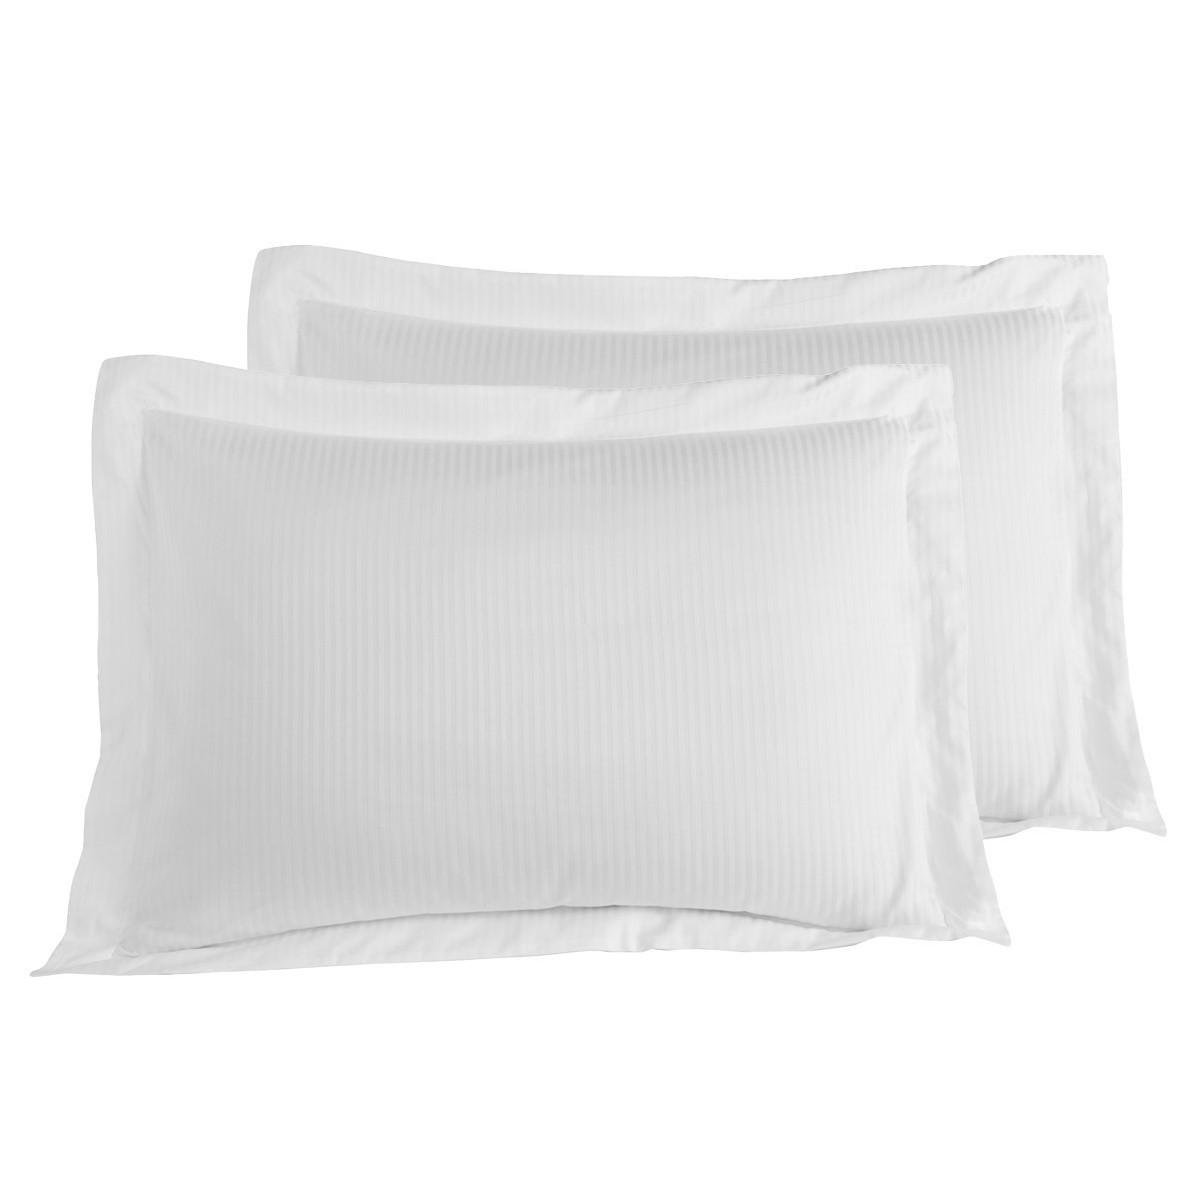 2 taies d'oreiller rayées satin coton Blanc 50x70 cm